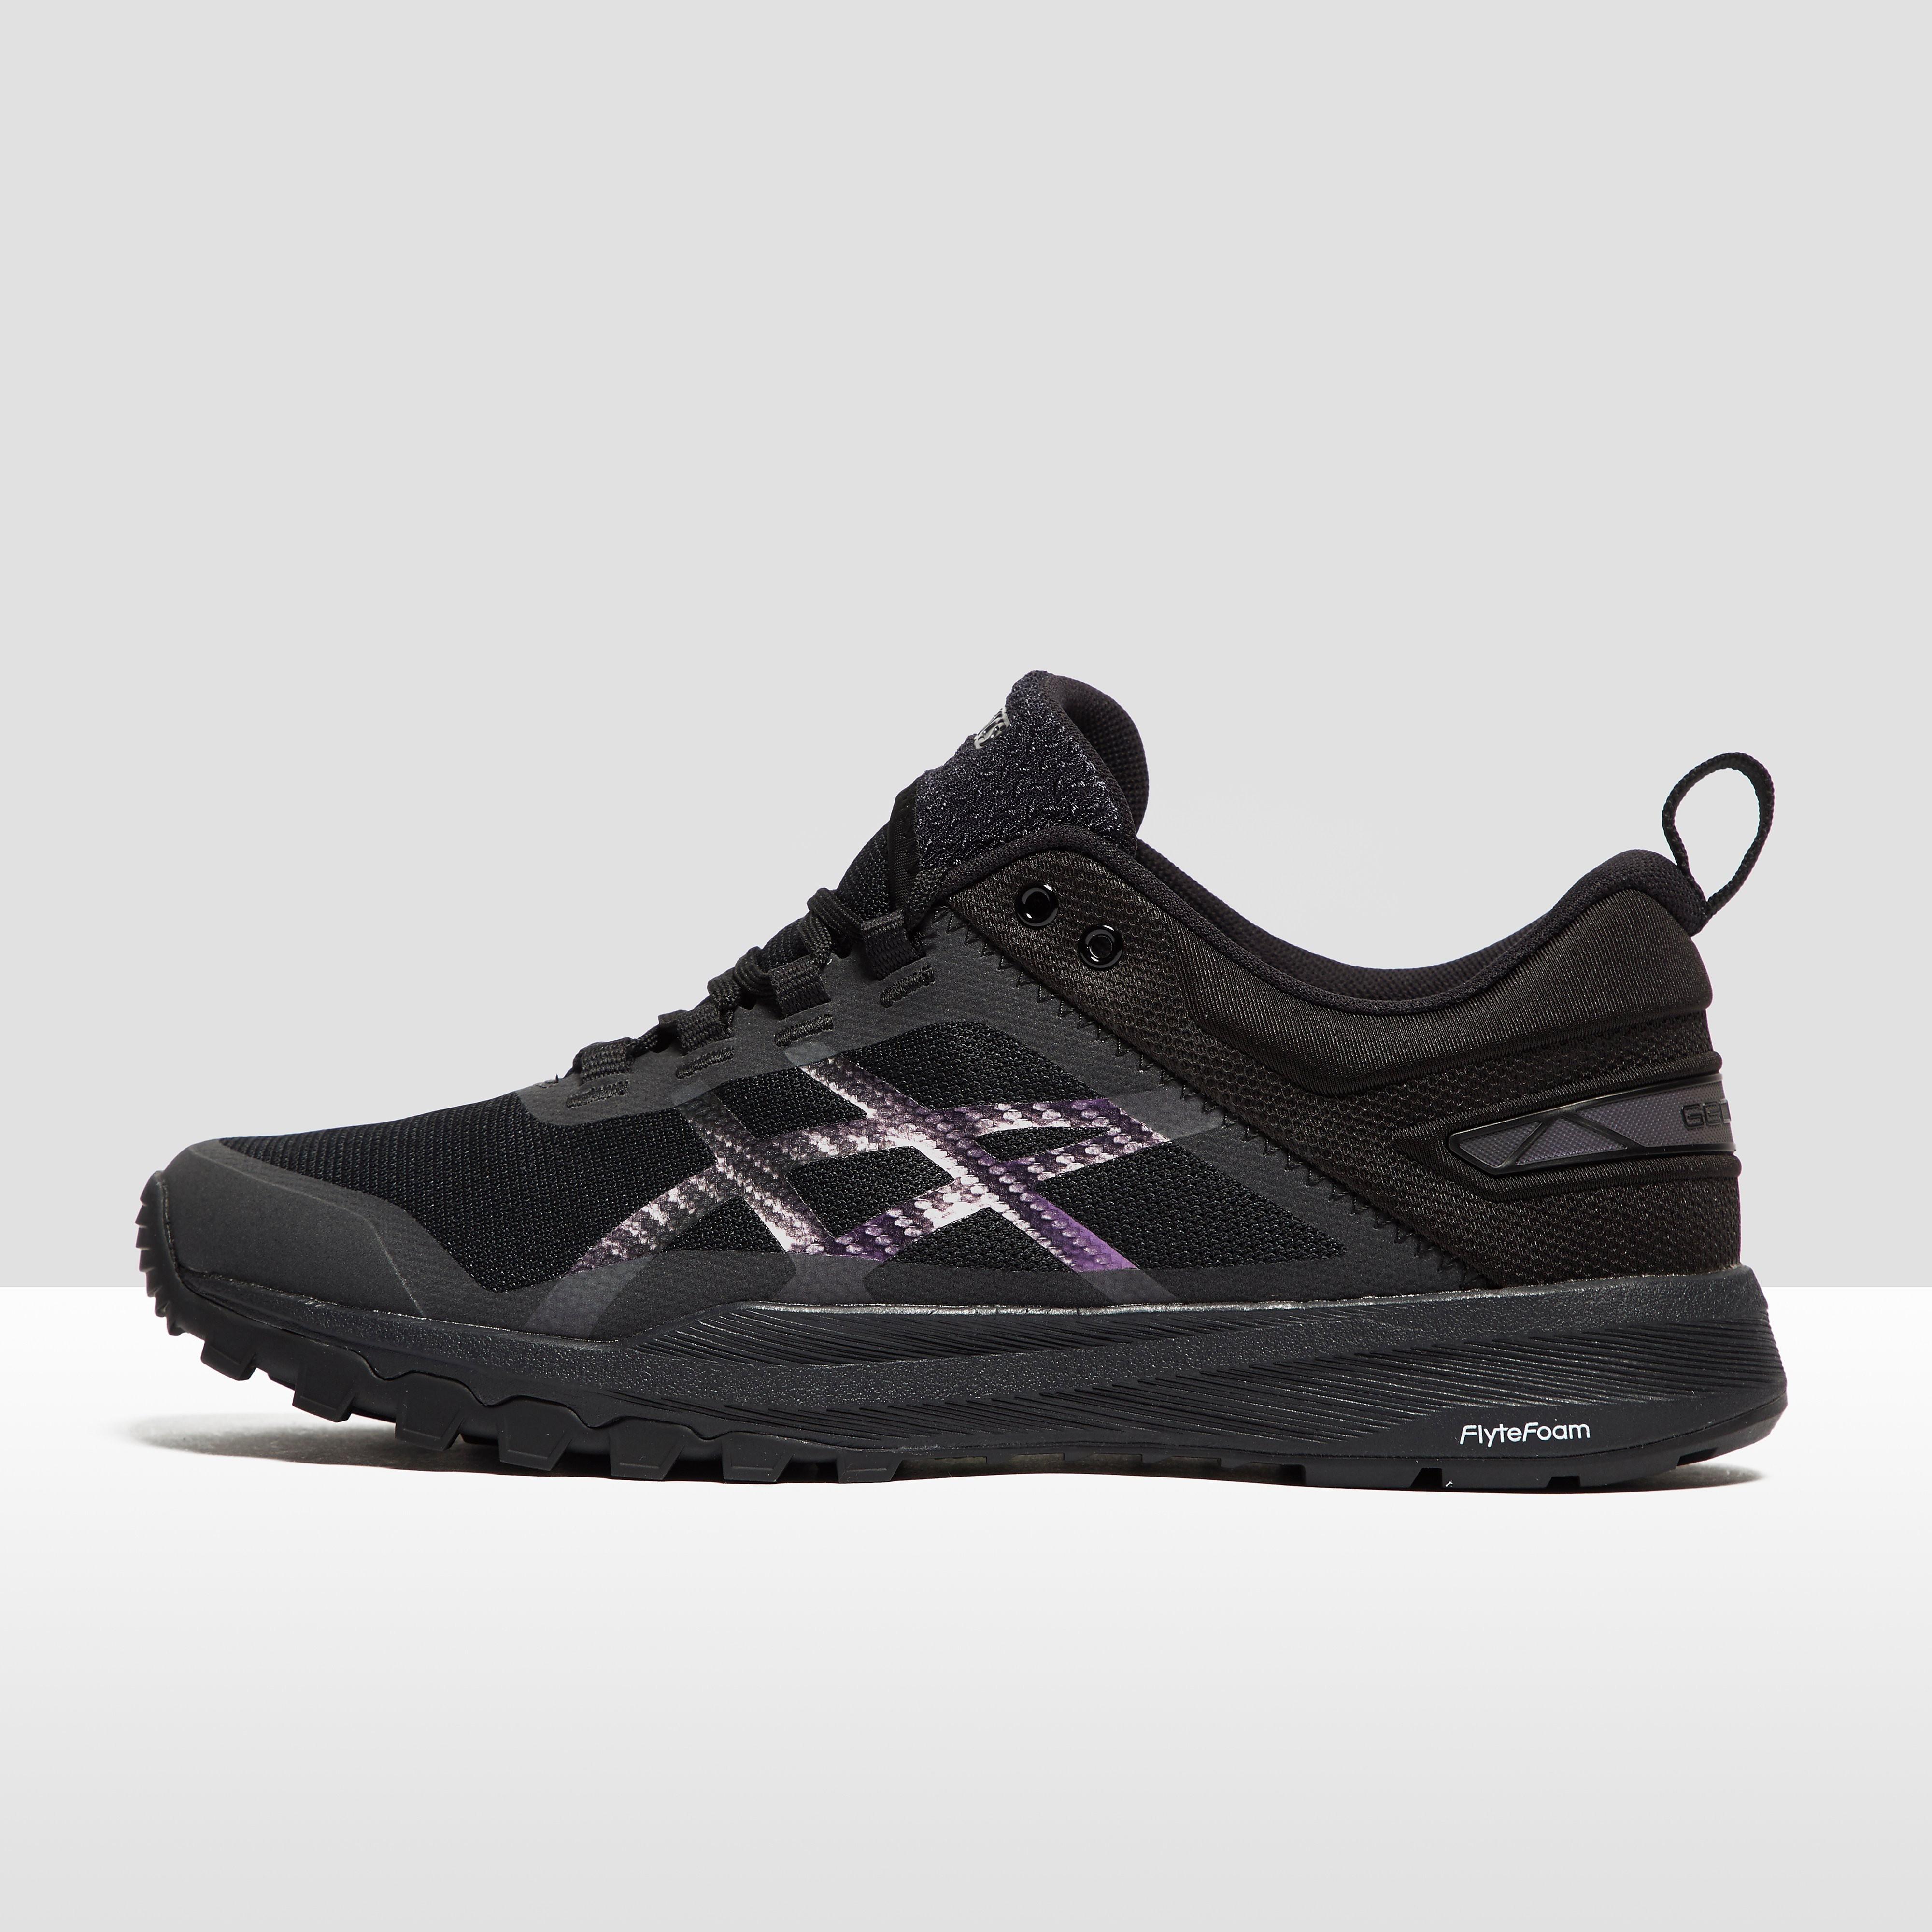 ASICS GECKO XT Men's Training Shoes